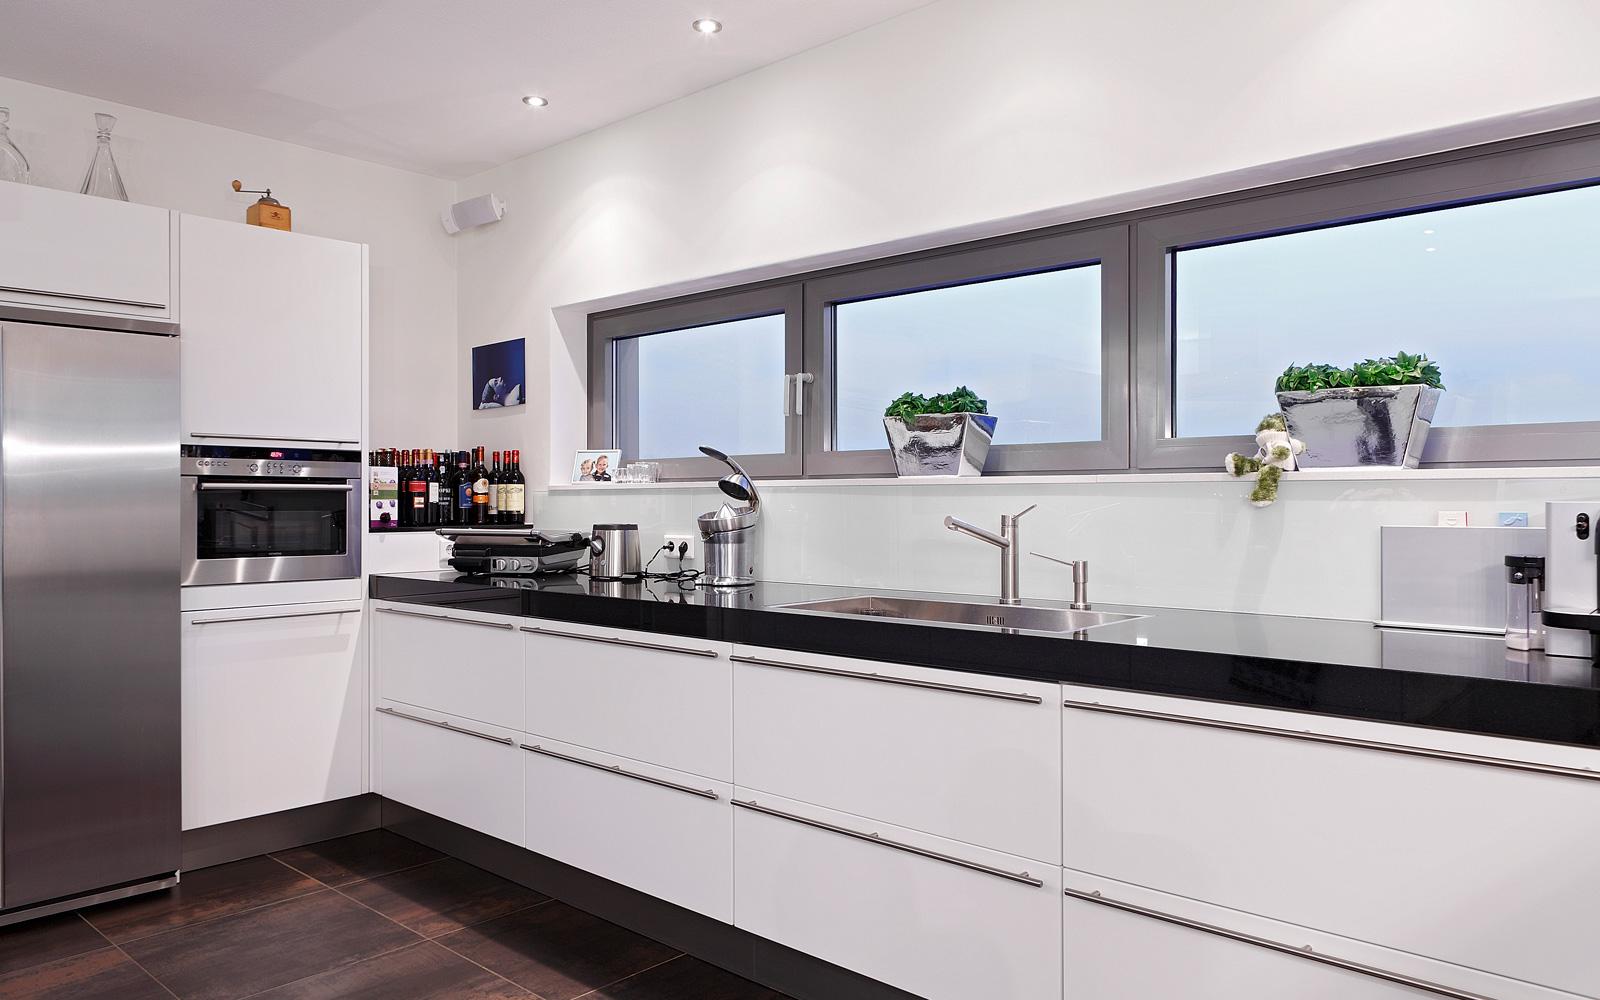 Keuken, strak, wit, aanrecht, koelkast, ASWA Keukens penthouse, crepain Binst